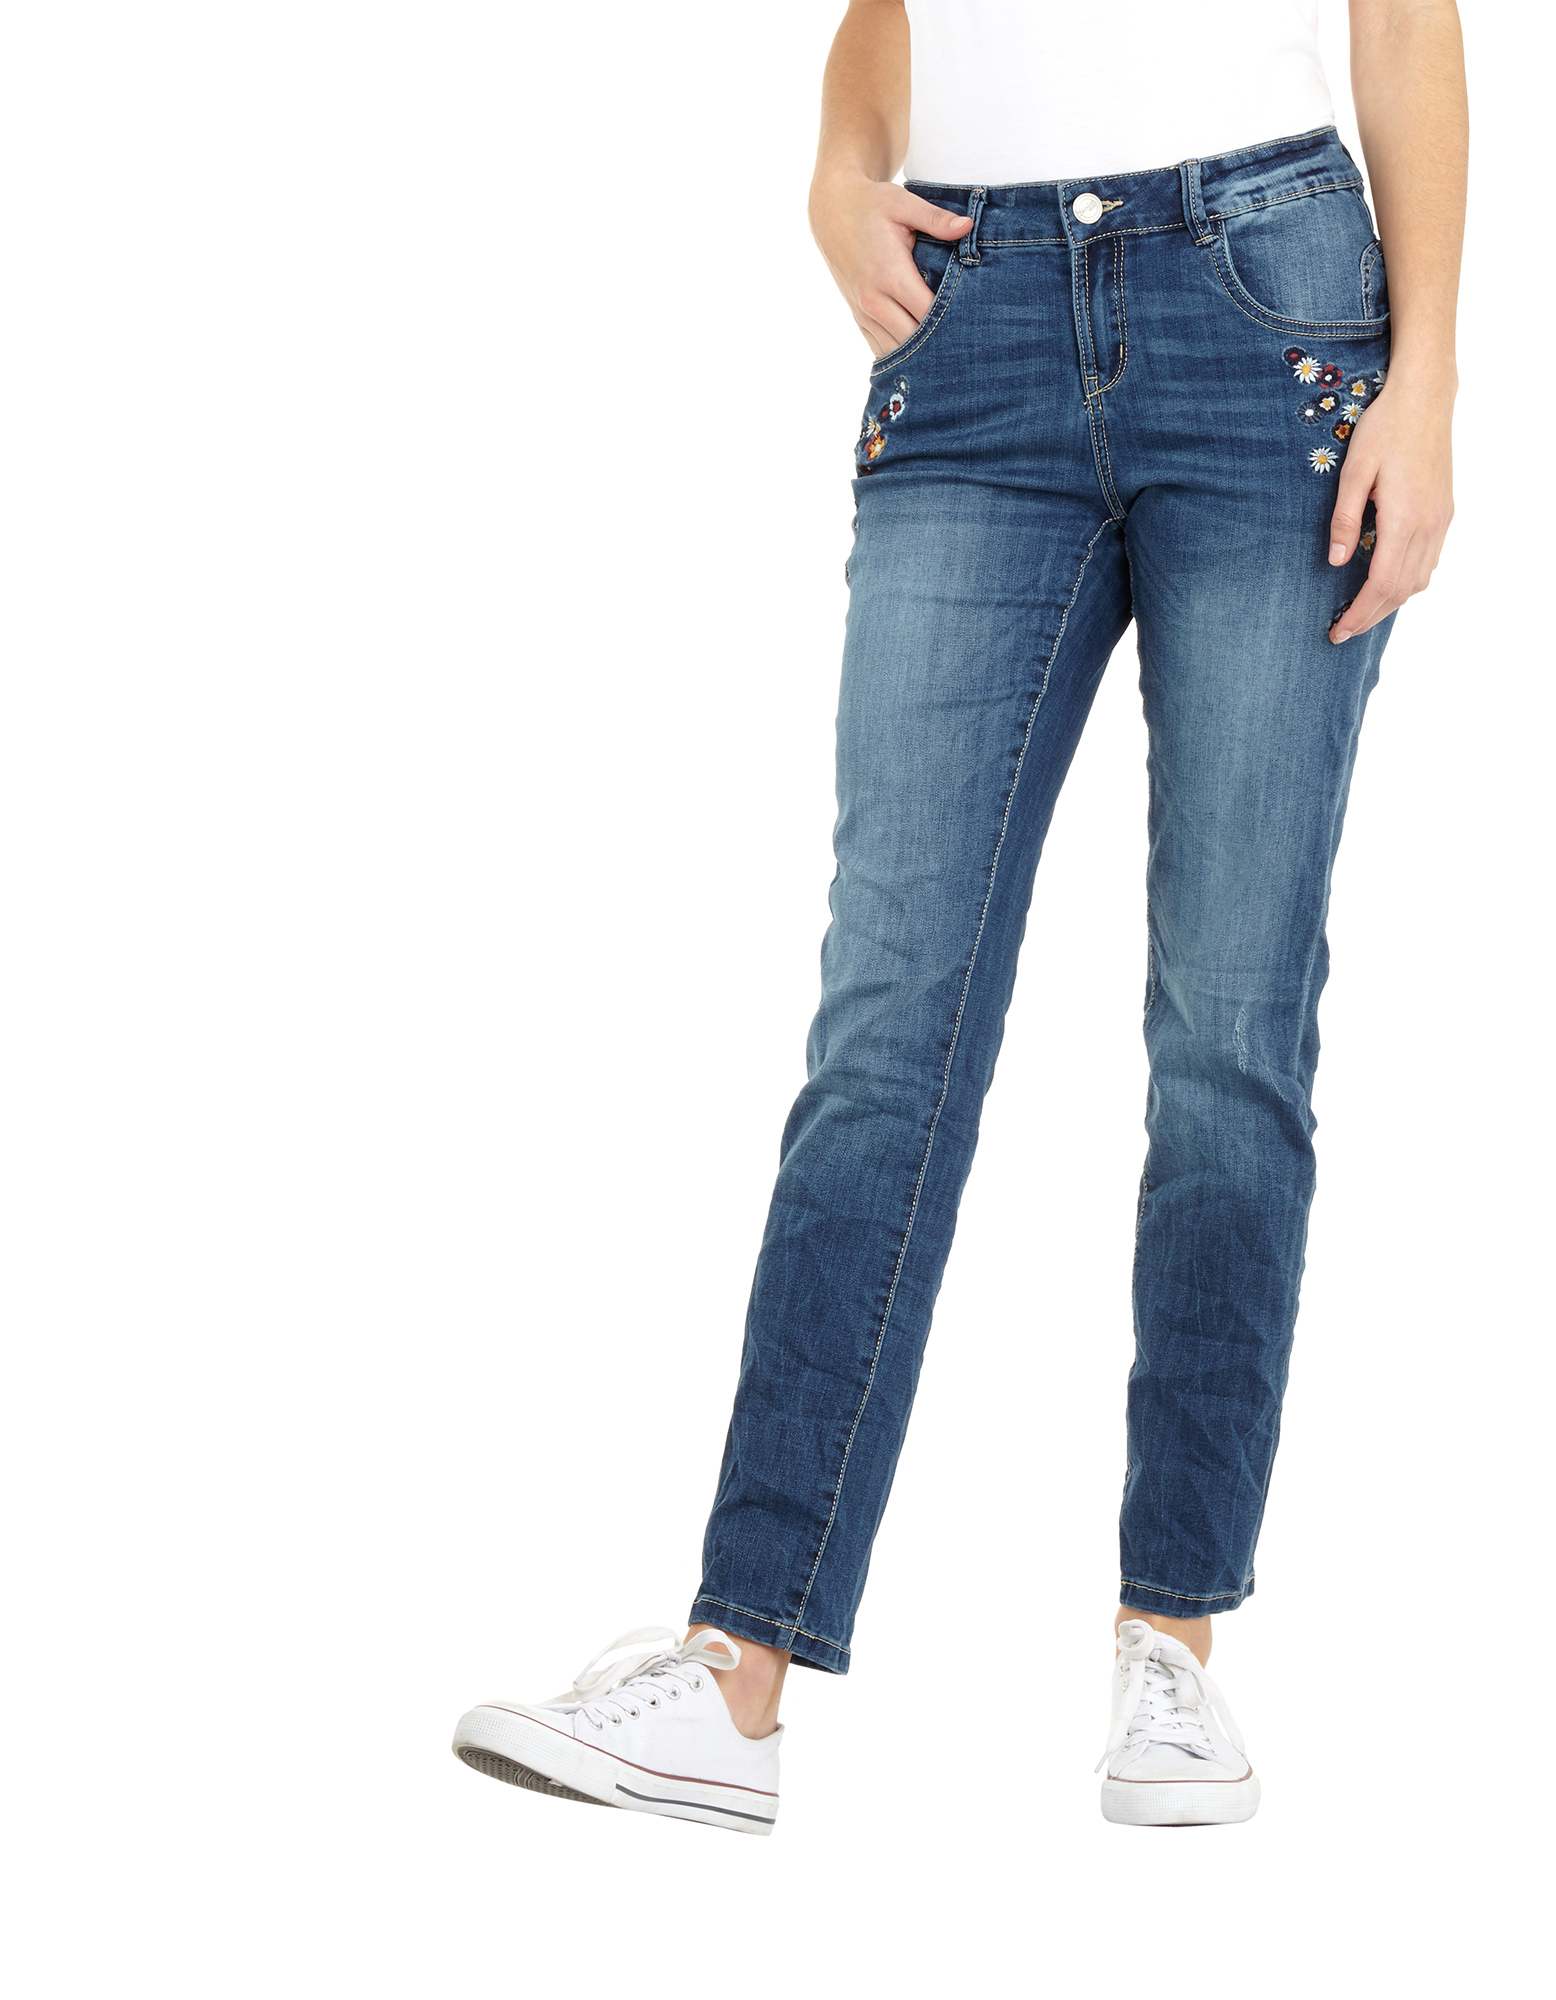 damen slim fit jeans im used look takko fashion. Black Bedroom Furniture Sets. Home Design Ideas